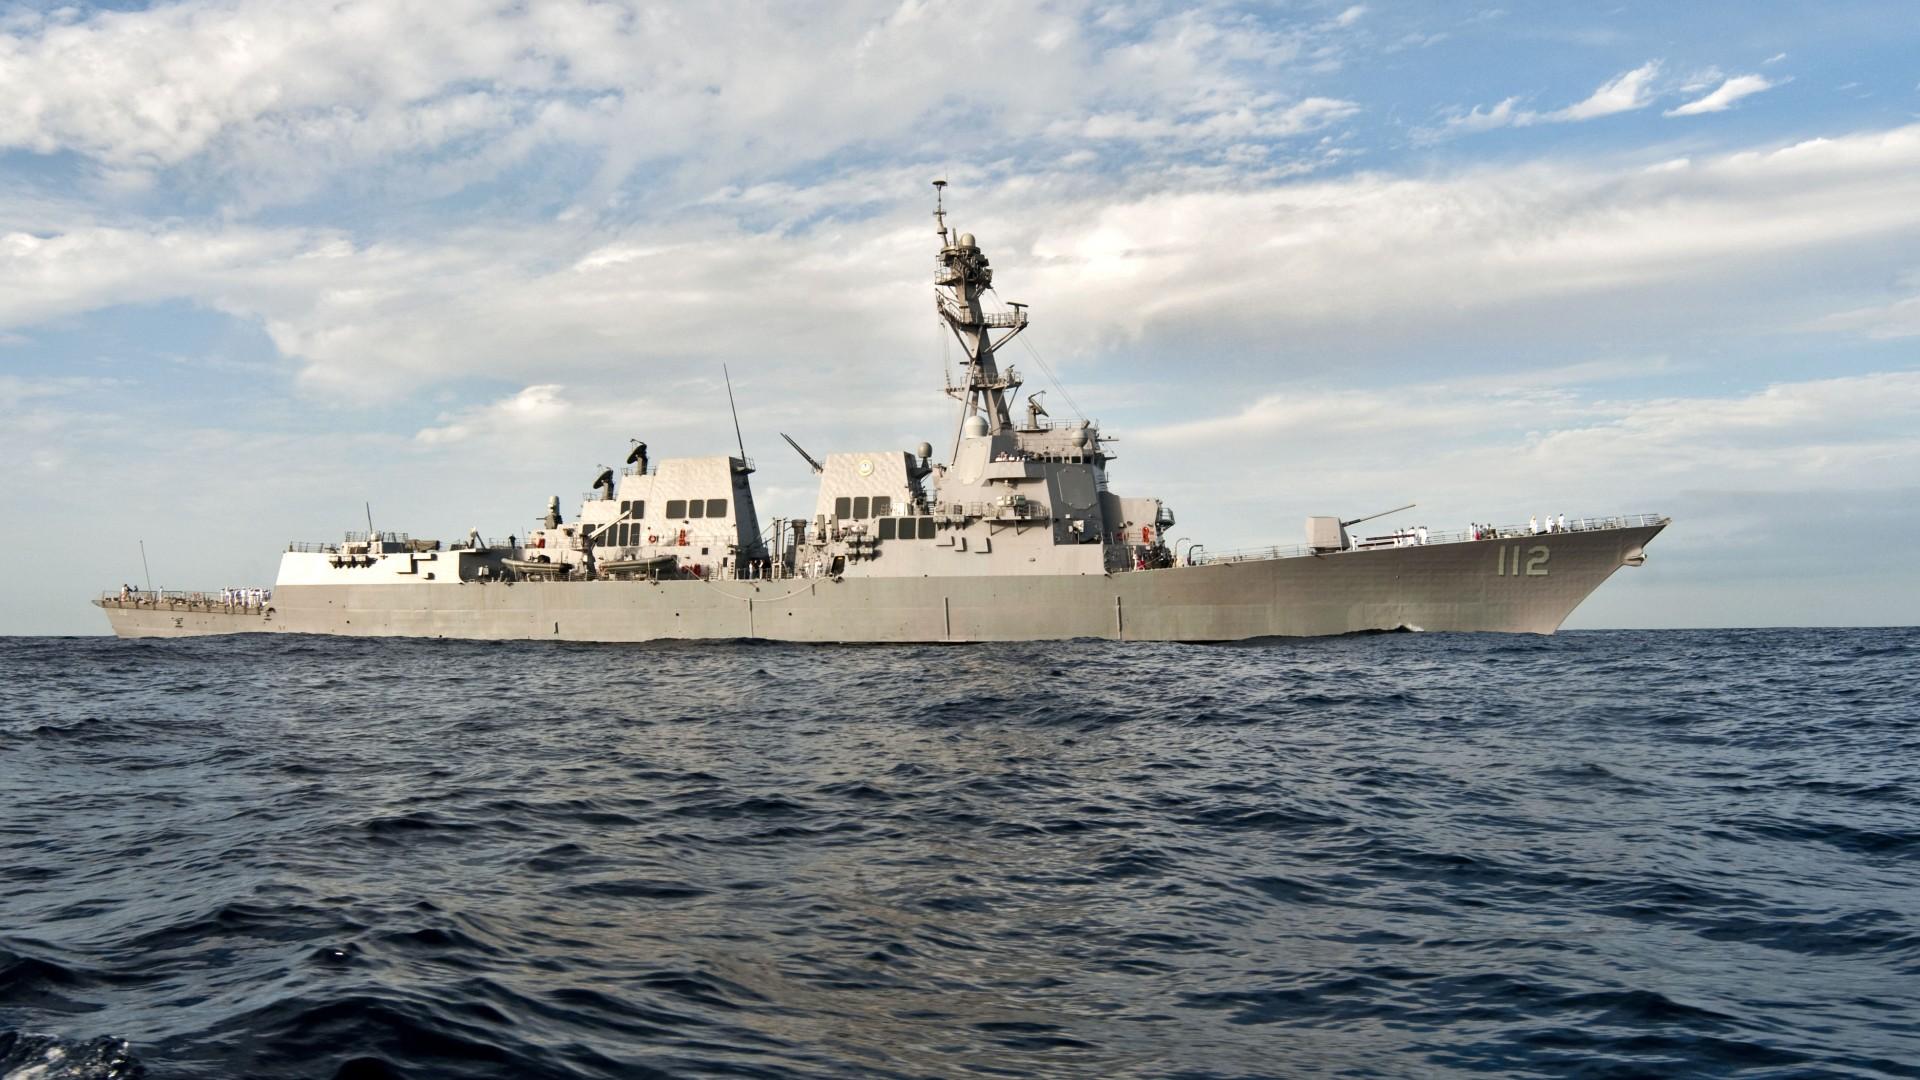 Wallpaper Uss Arleigh Burke Ddg 51 Lead Ship Arleigh